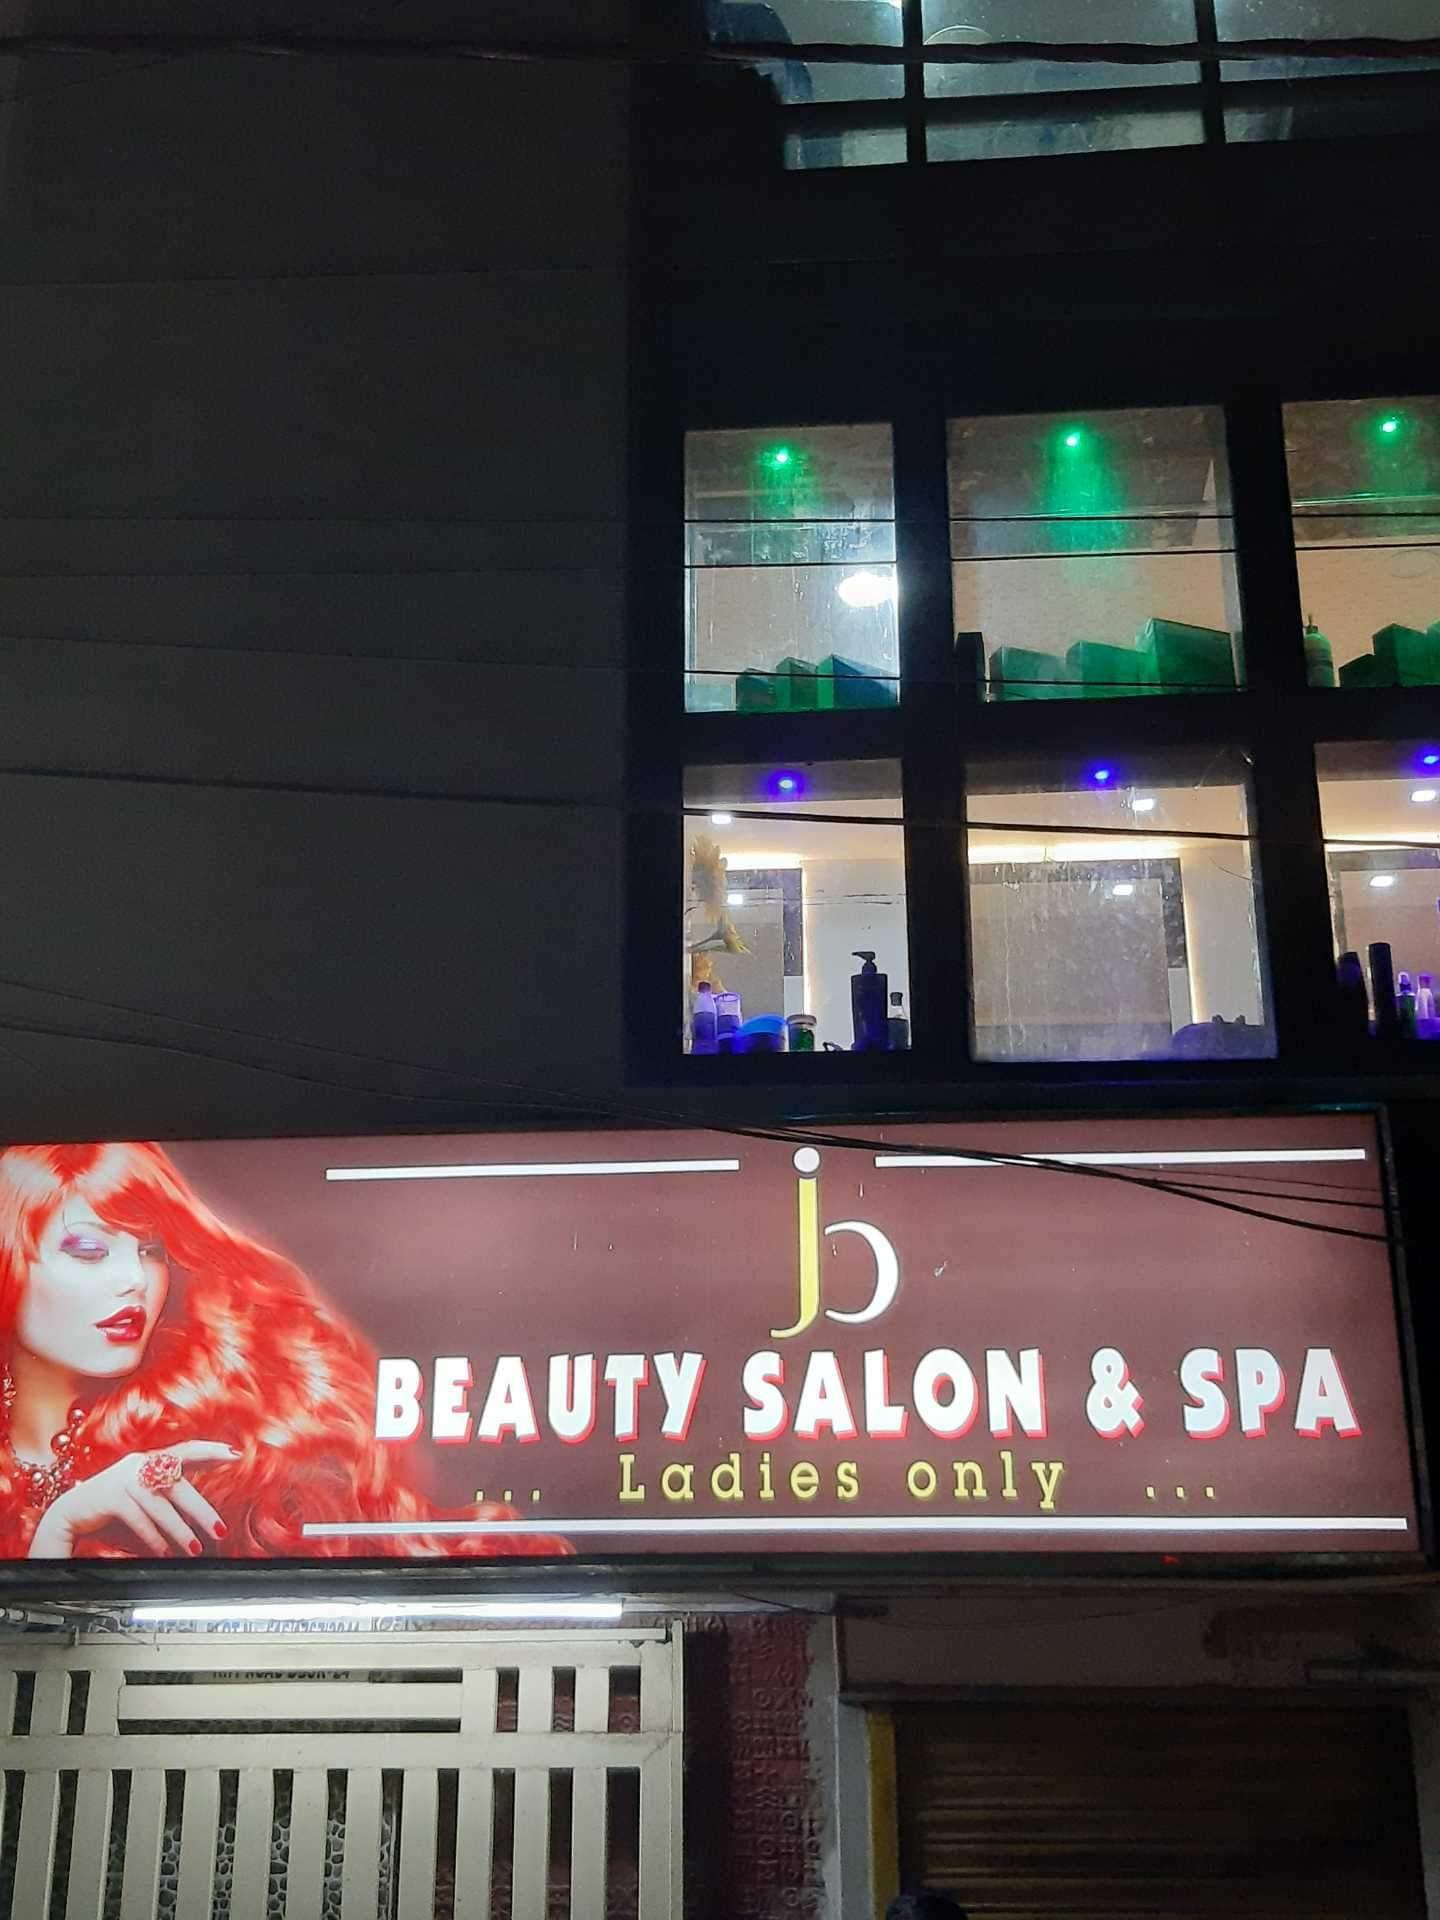 Top 30 Hair Stylists in Kharvel Nagar, Bhubaneshwar - Best